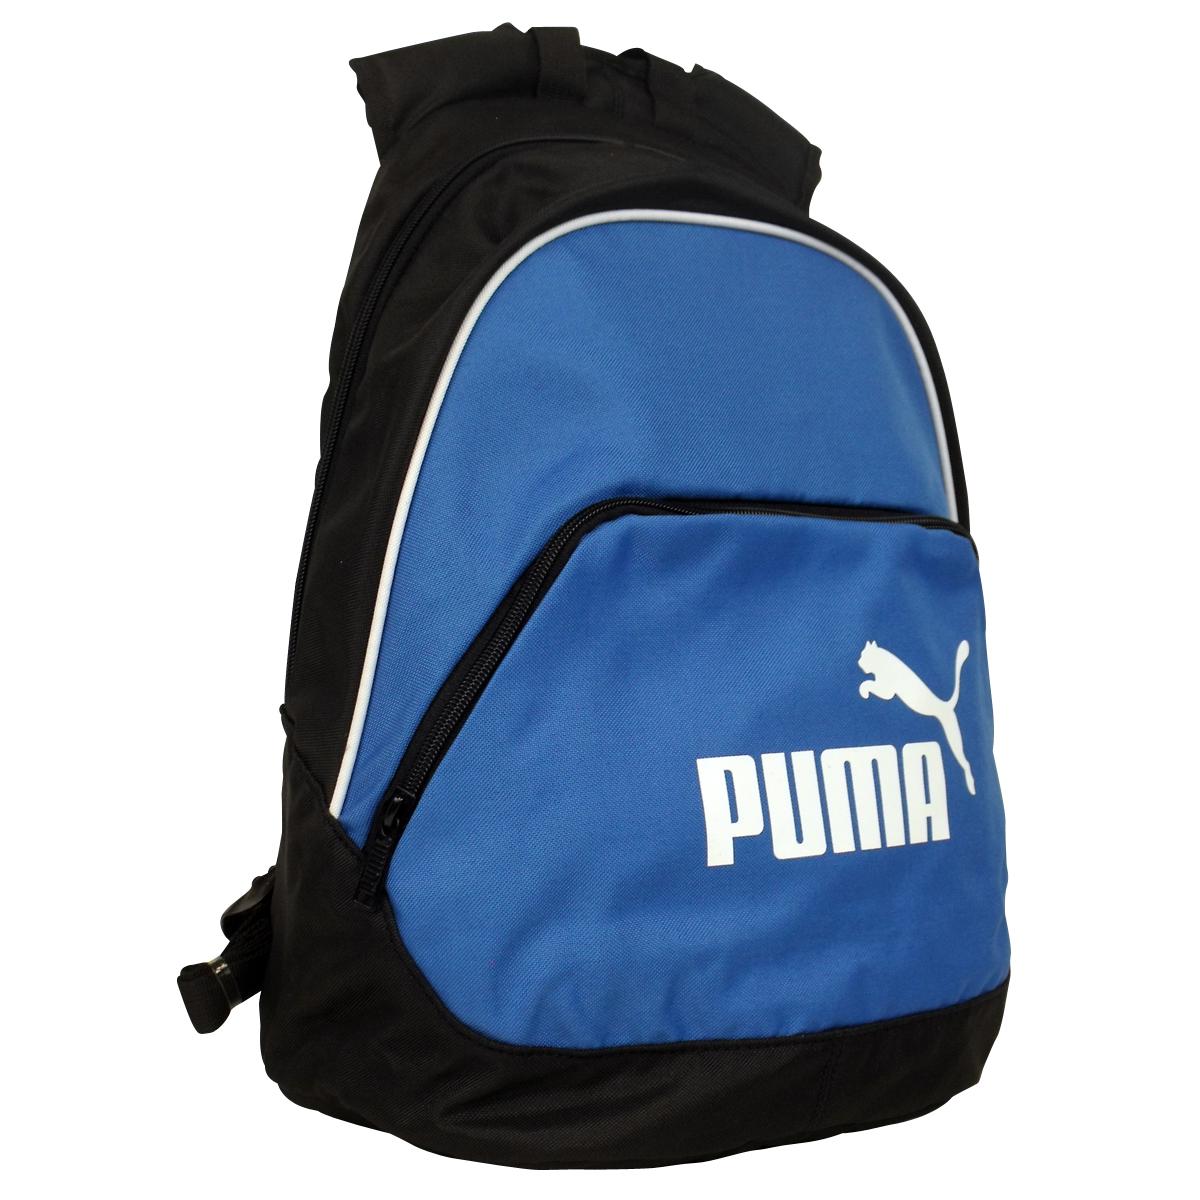 boys puma student school rucksack backpack mens work bag